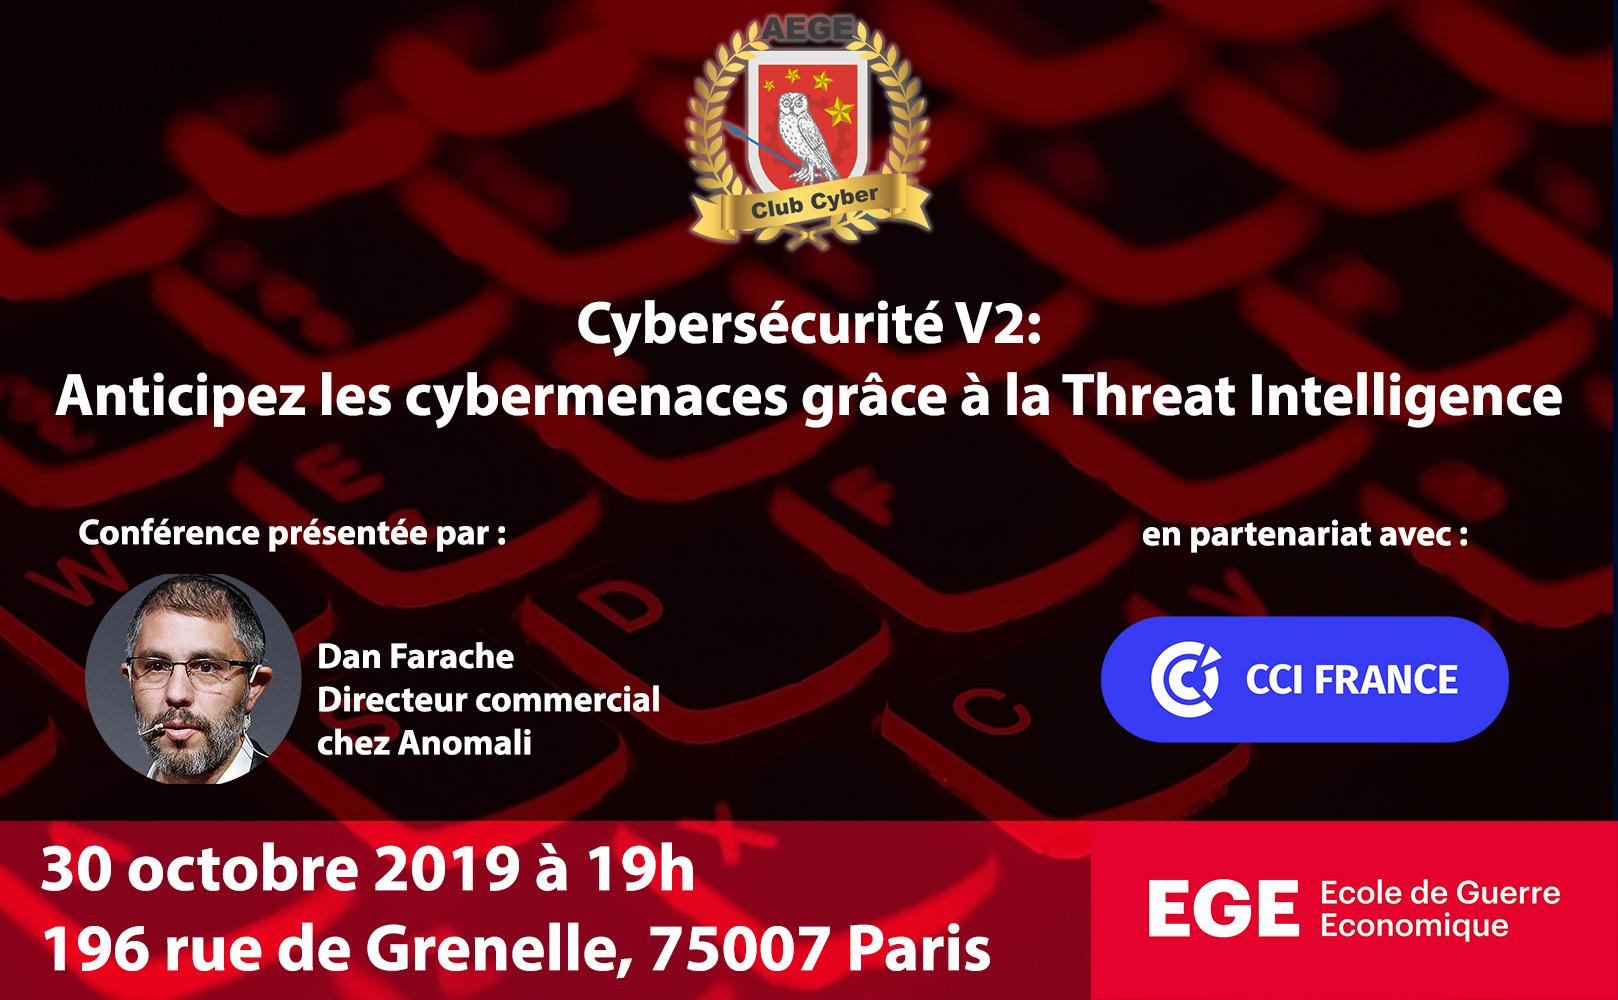 Presentation conference Anomali AEGE club Cyber Freani